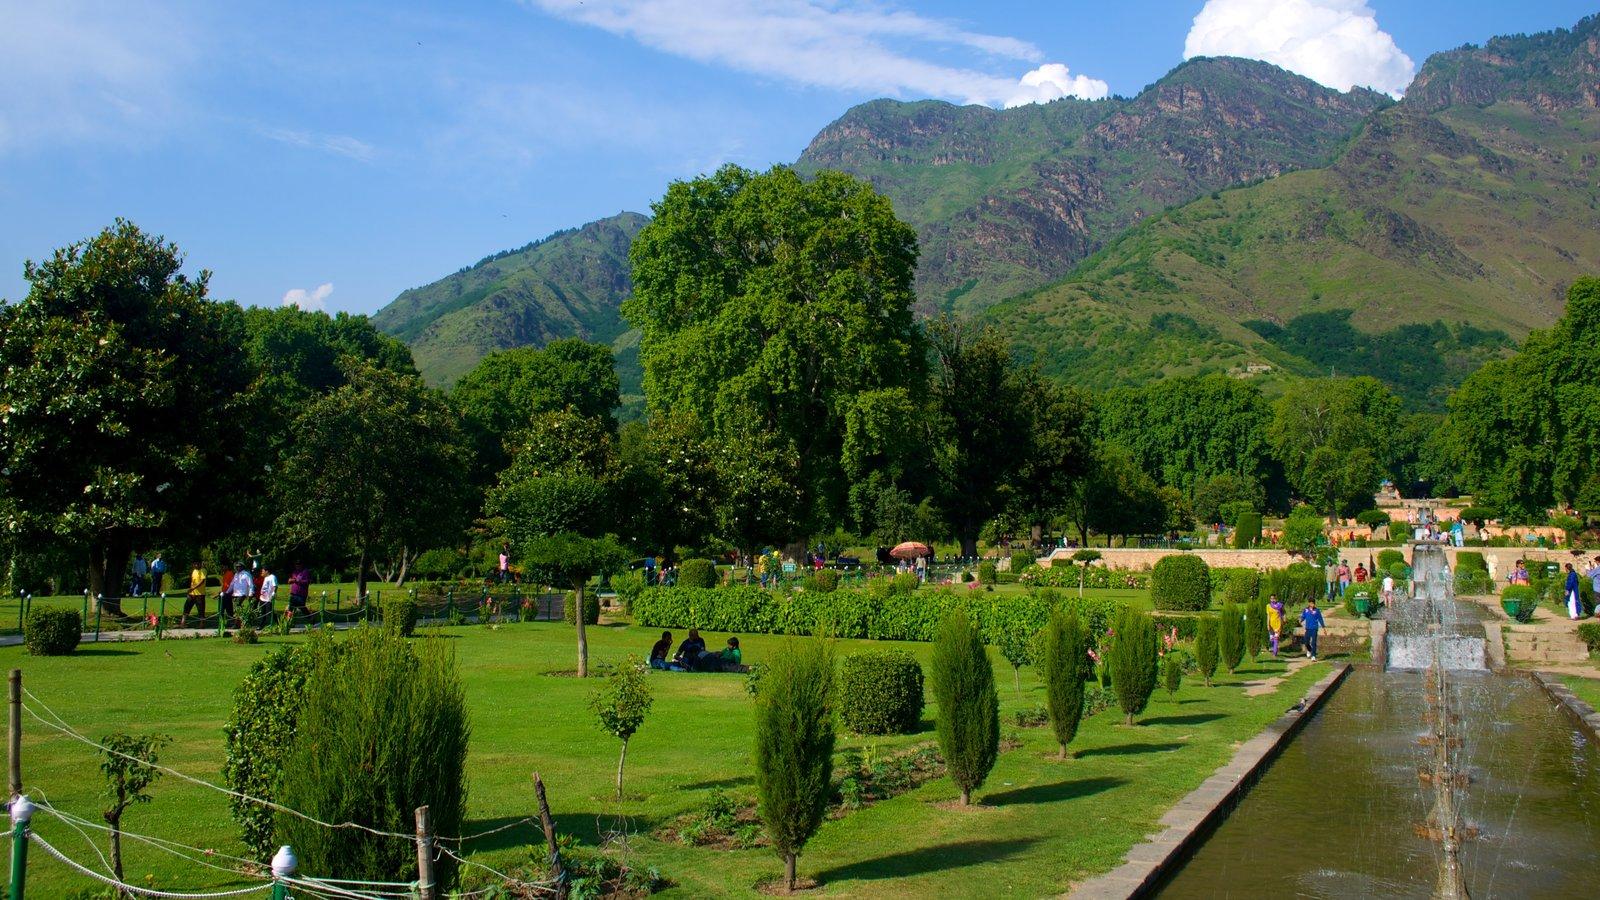 Mughal Gardens showing a garden